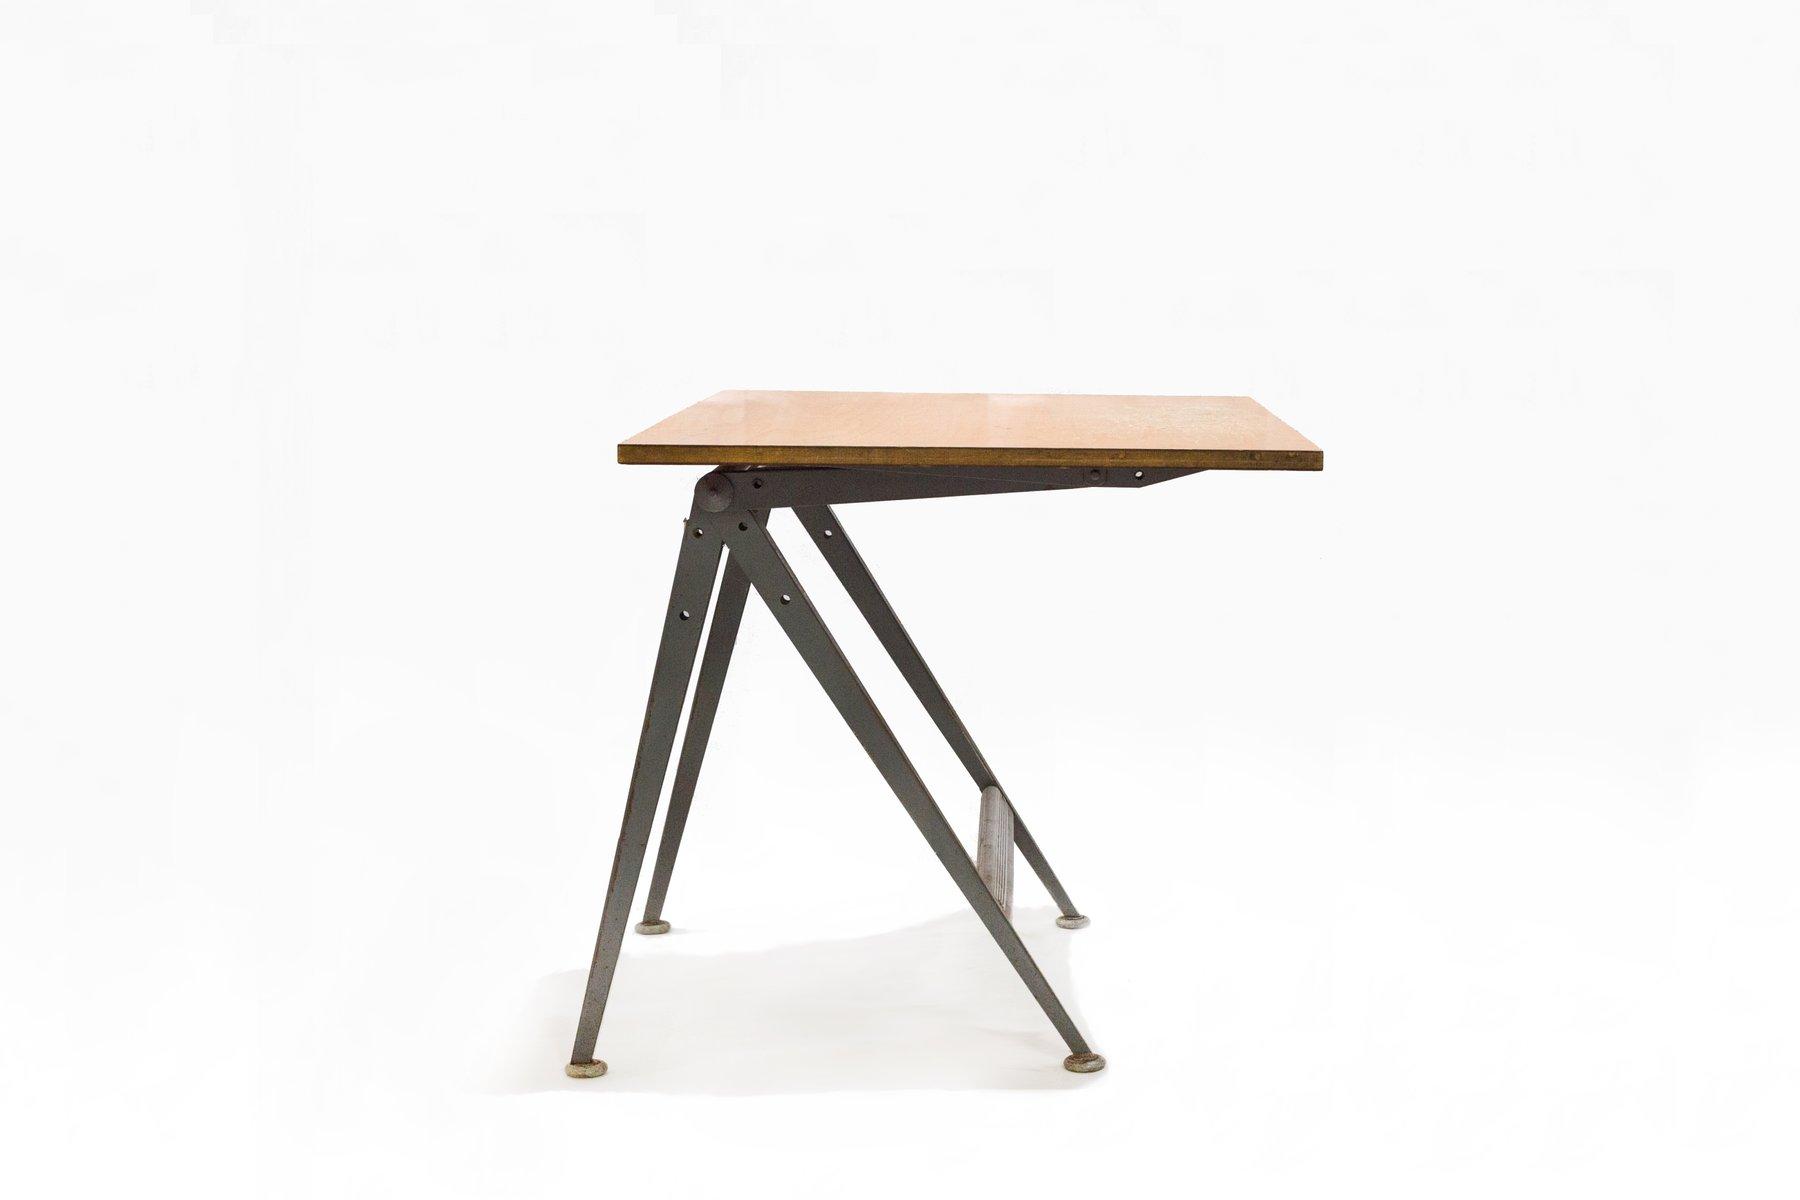 Vintage Drawing Table By Friso Kramer For Ahrend De Cirkel